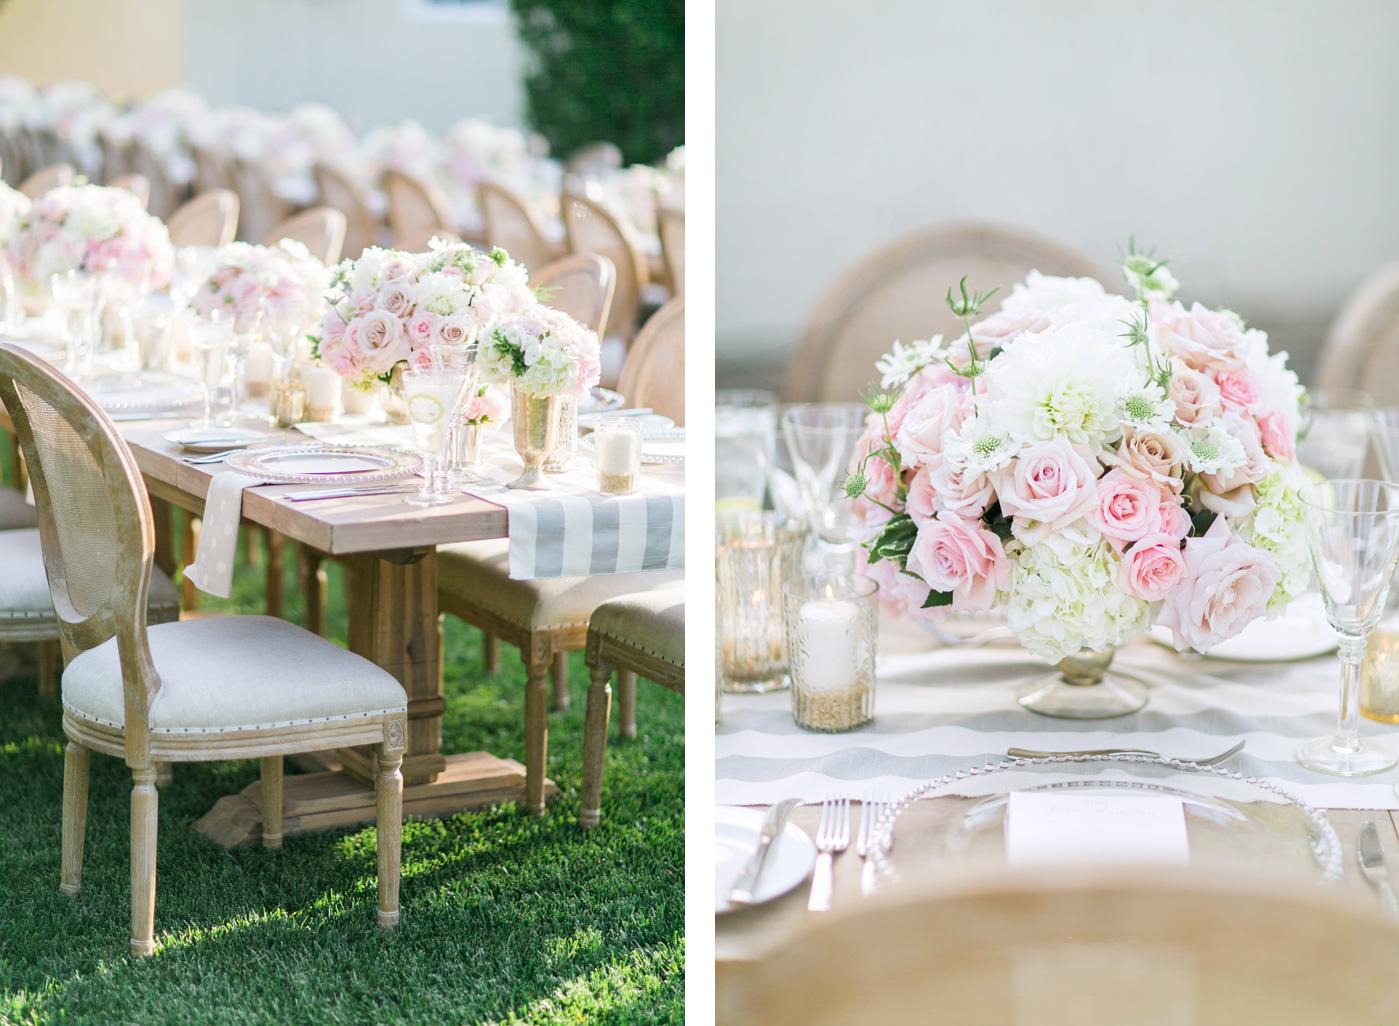 Inn-Rancho-Santa-Fe-Wedding-31